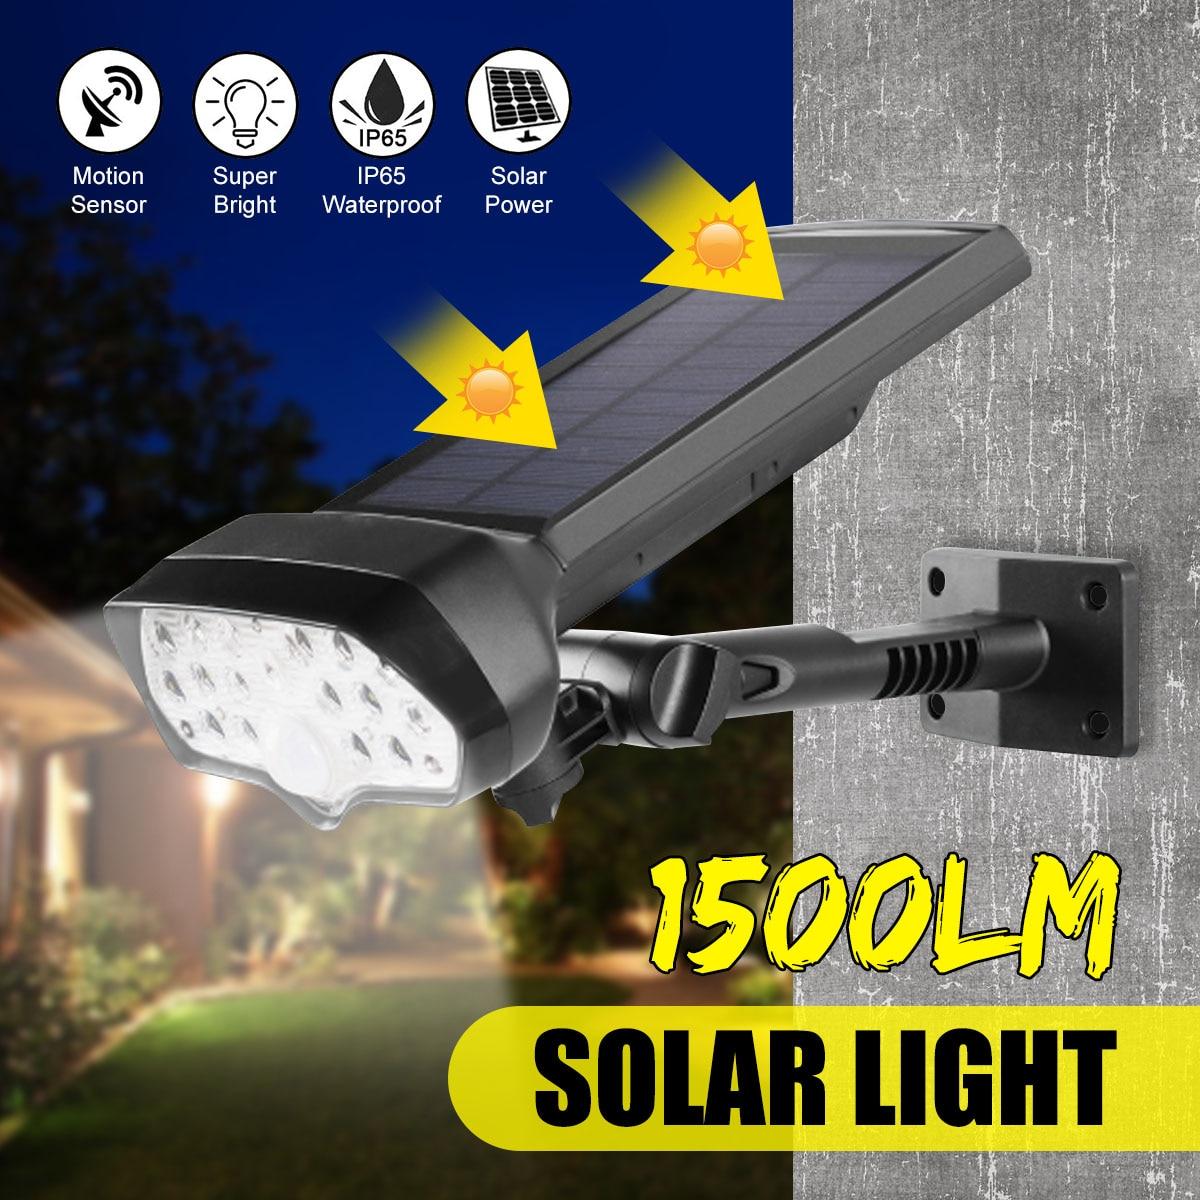 1500LM LED Solar Spotlights Wall Lamp Waterproof PIR Motion Sensor 17LED Solar Wall Light Outdoor Security Lamp For Decoration